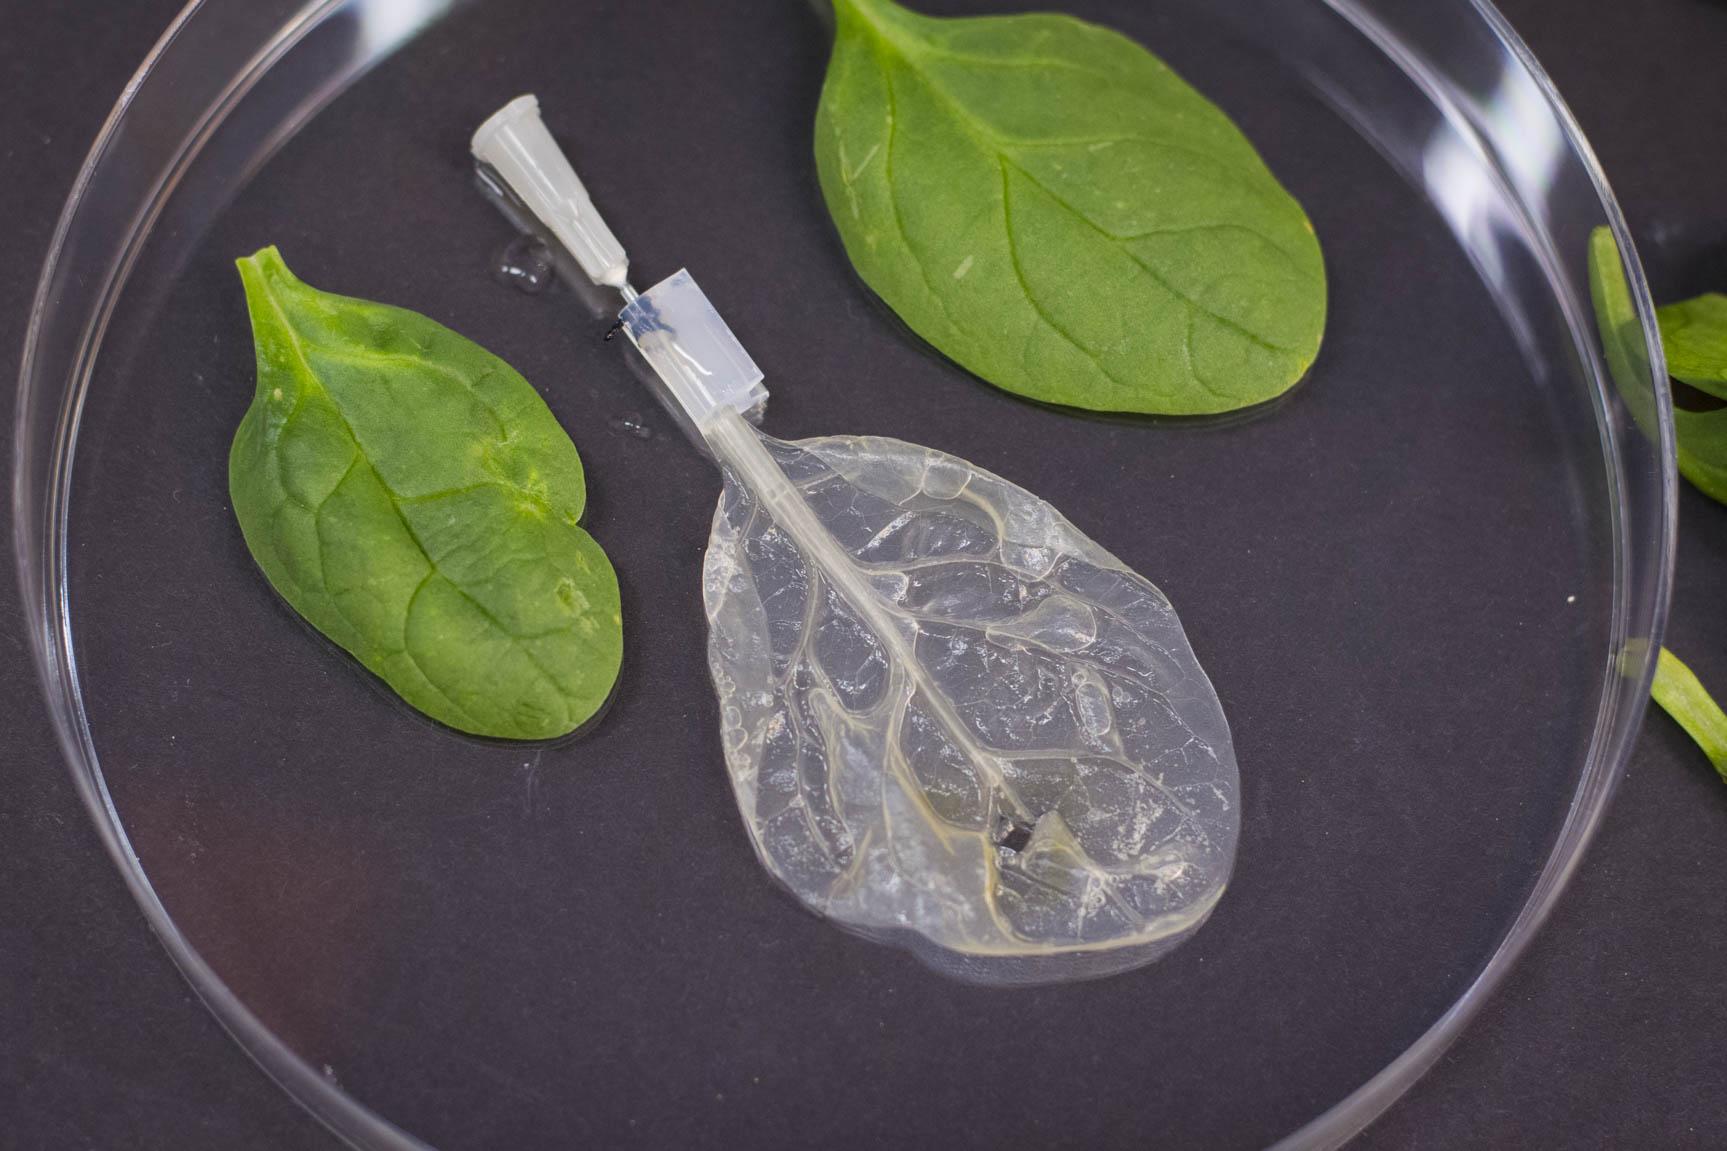 Decellularized spinach leaf